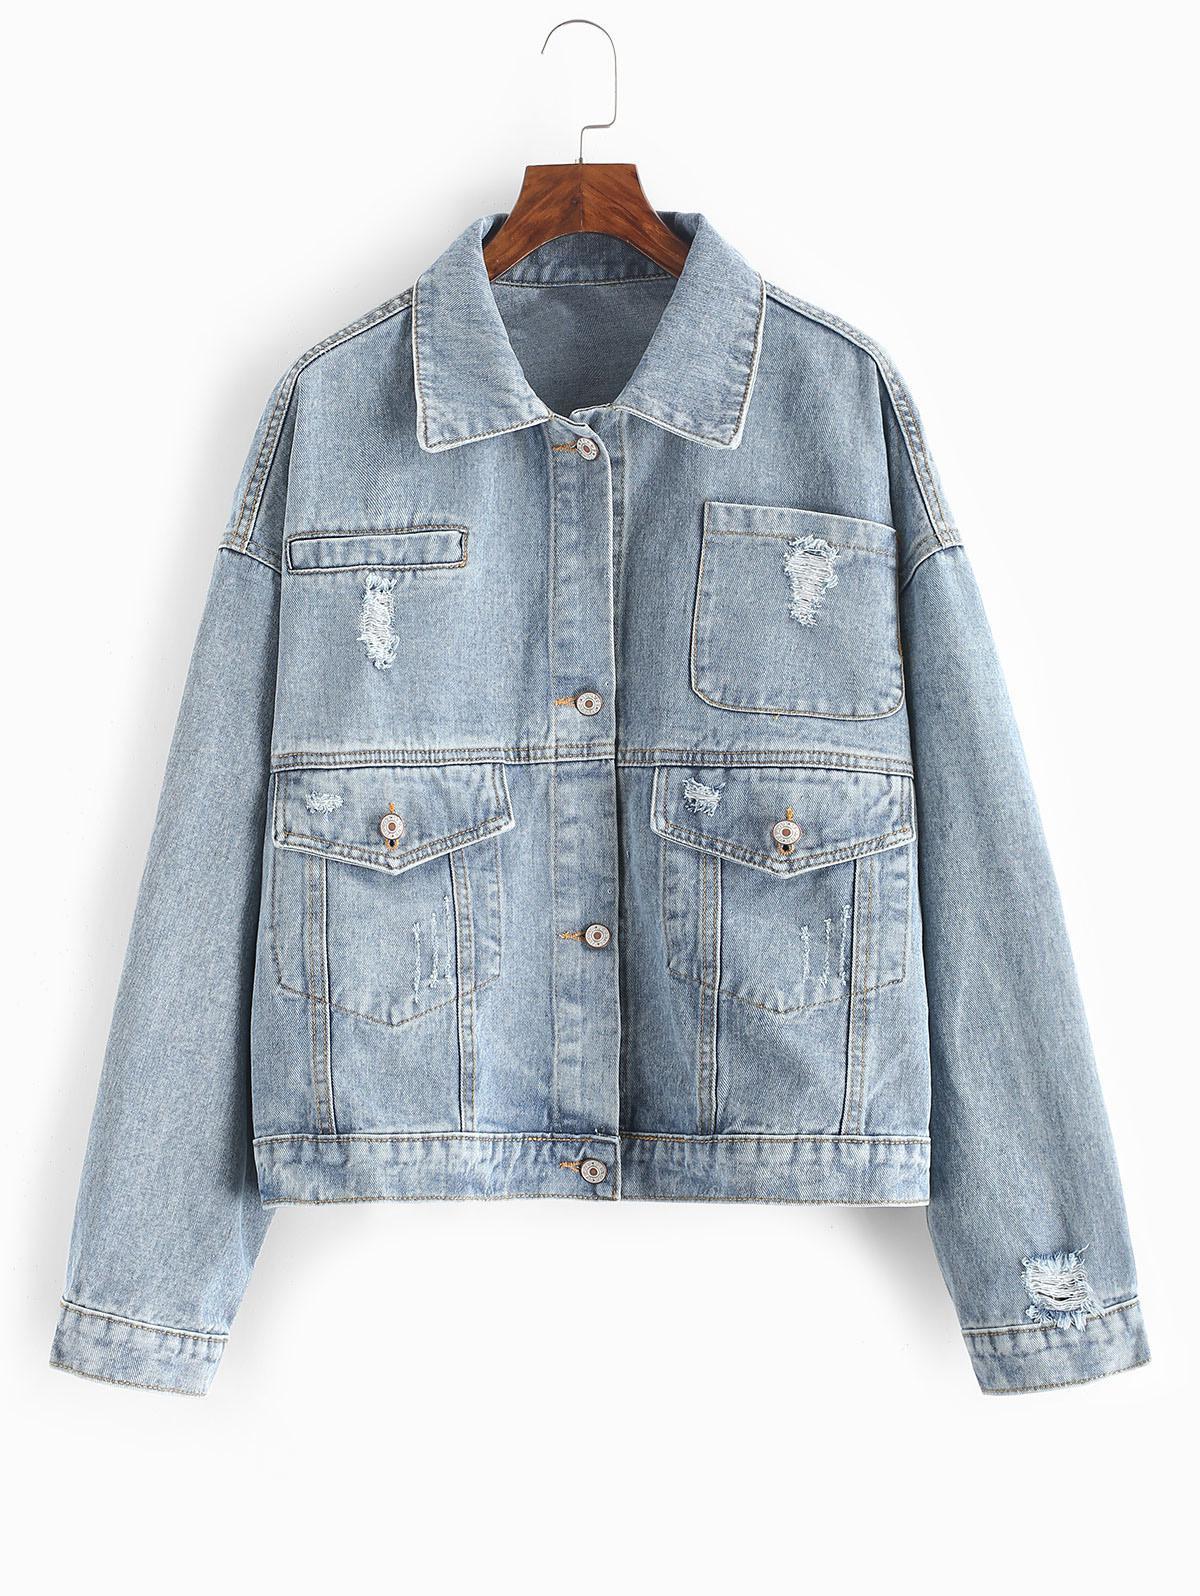 Ripped Flap Pocket Drop Shoulder Jean Jacket